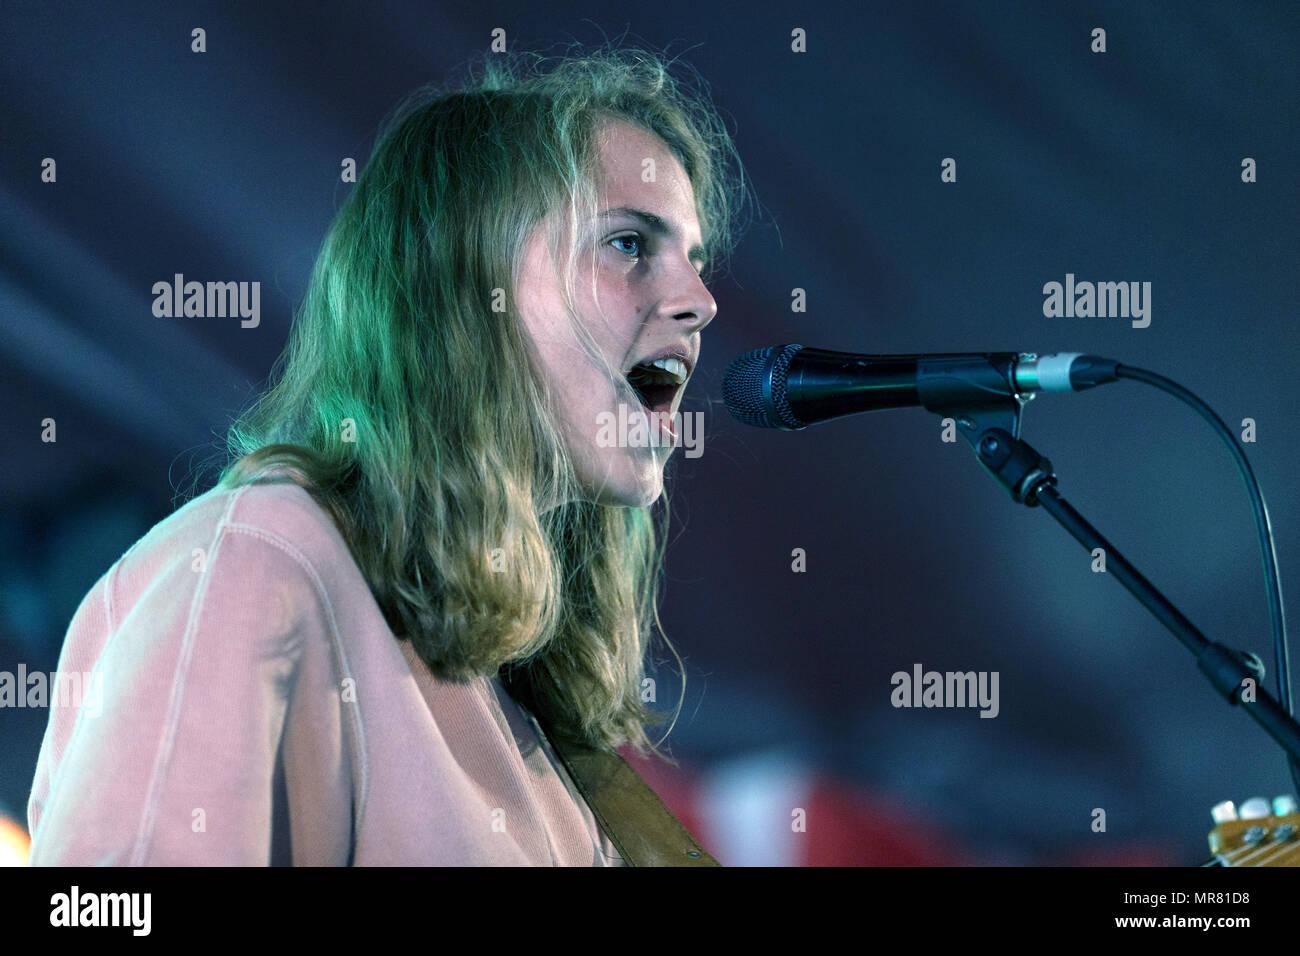 Marika Hackman performing live at Latitude Festival. Marika Hackman live, Marika Hackman onstage, Marika Hackman in concert. - Stock Image